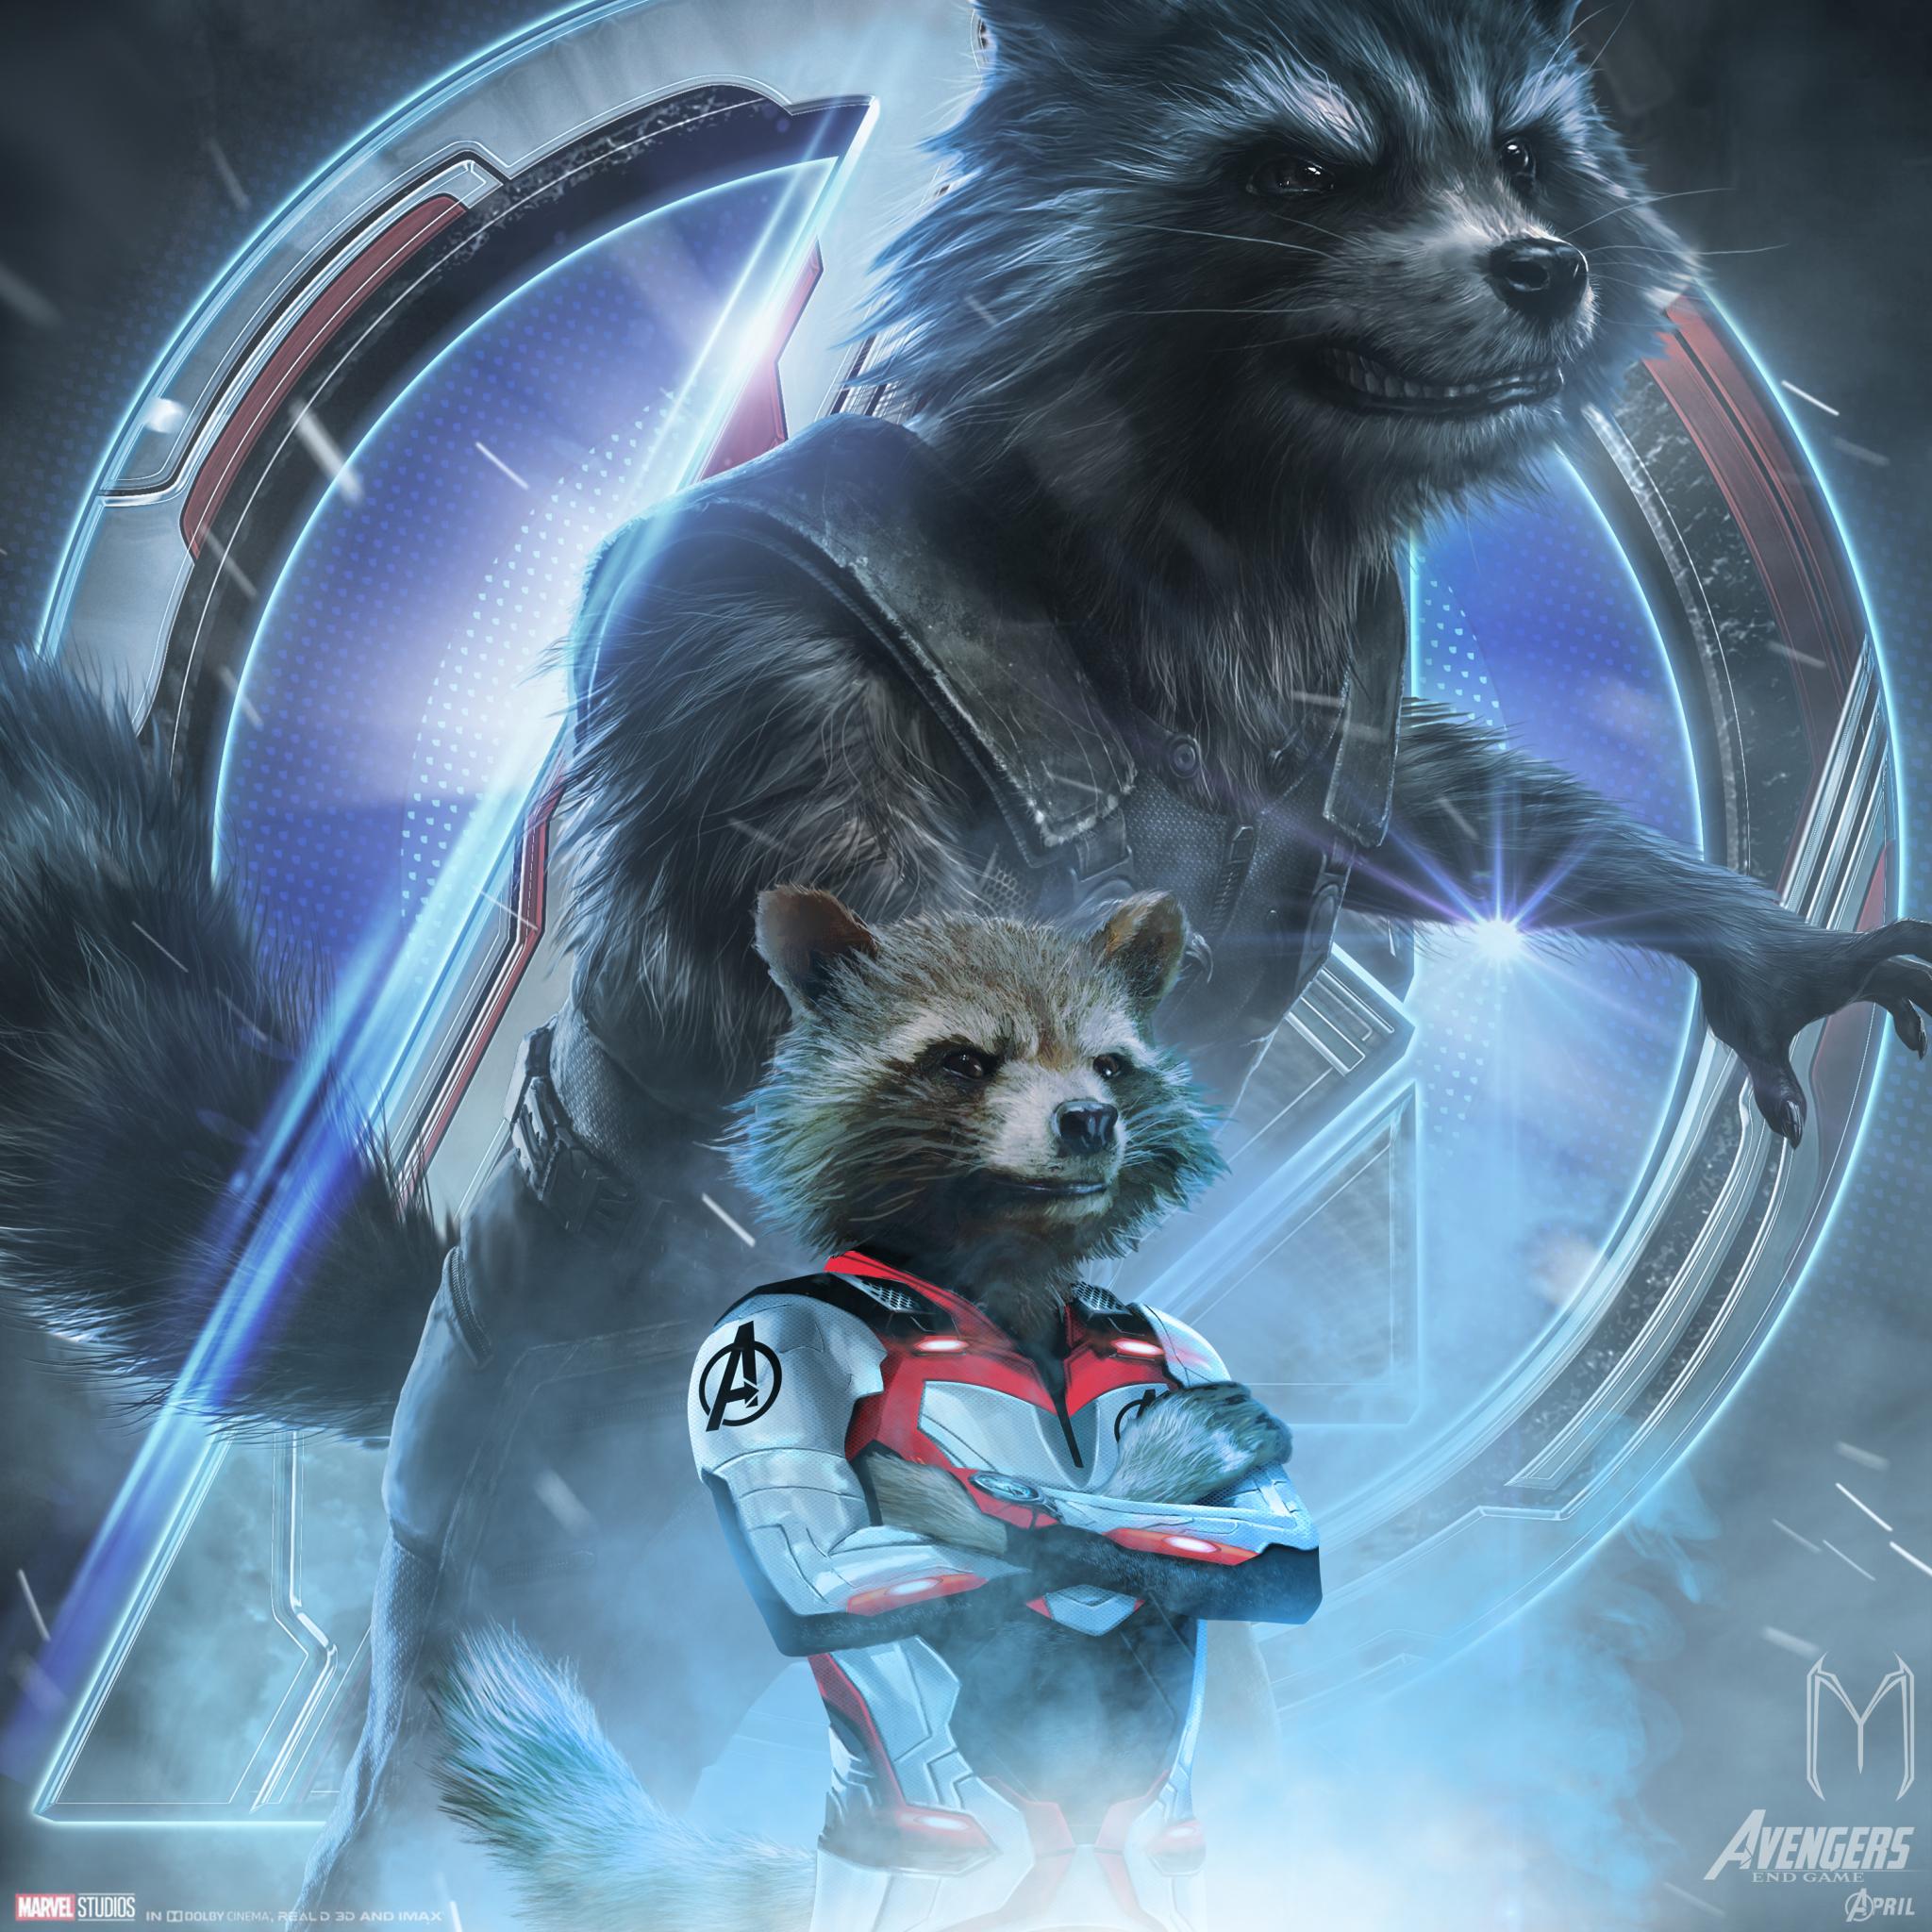 2048x2048 Avengers Endgame Rocket Raccoon Poster Art Ipad